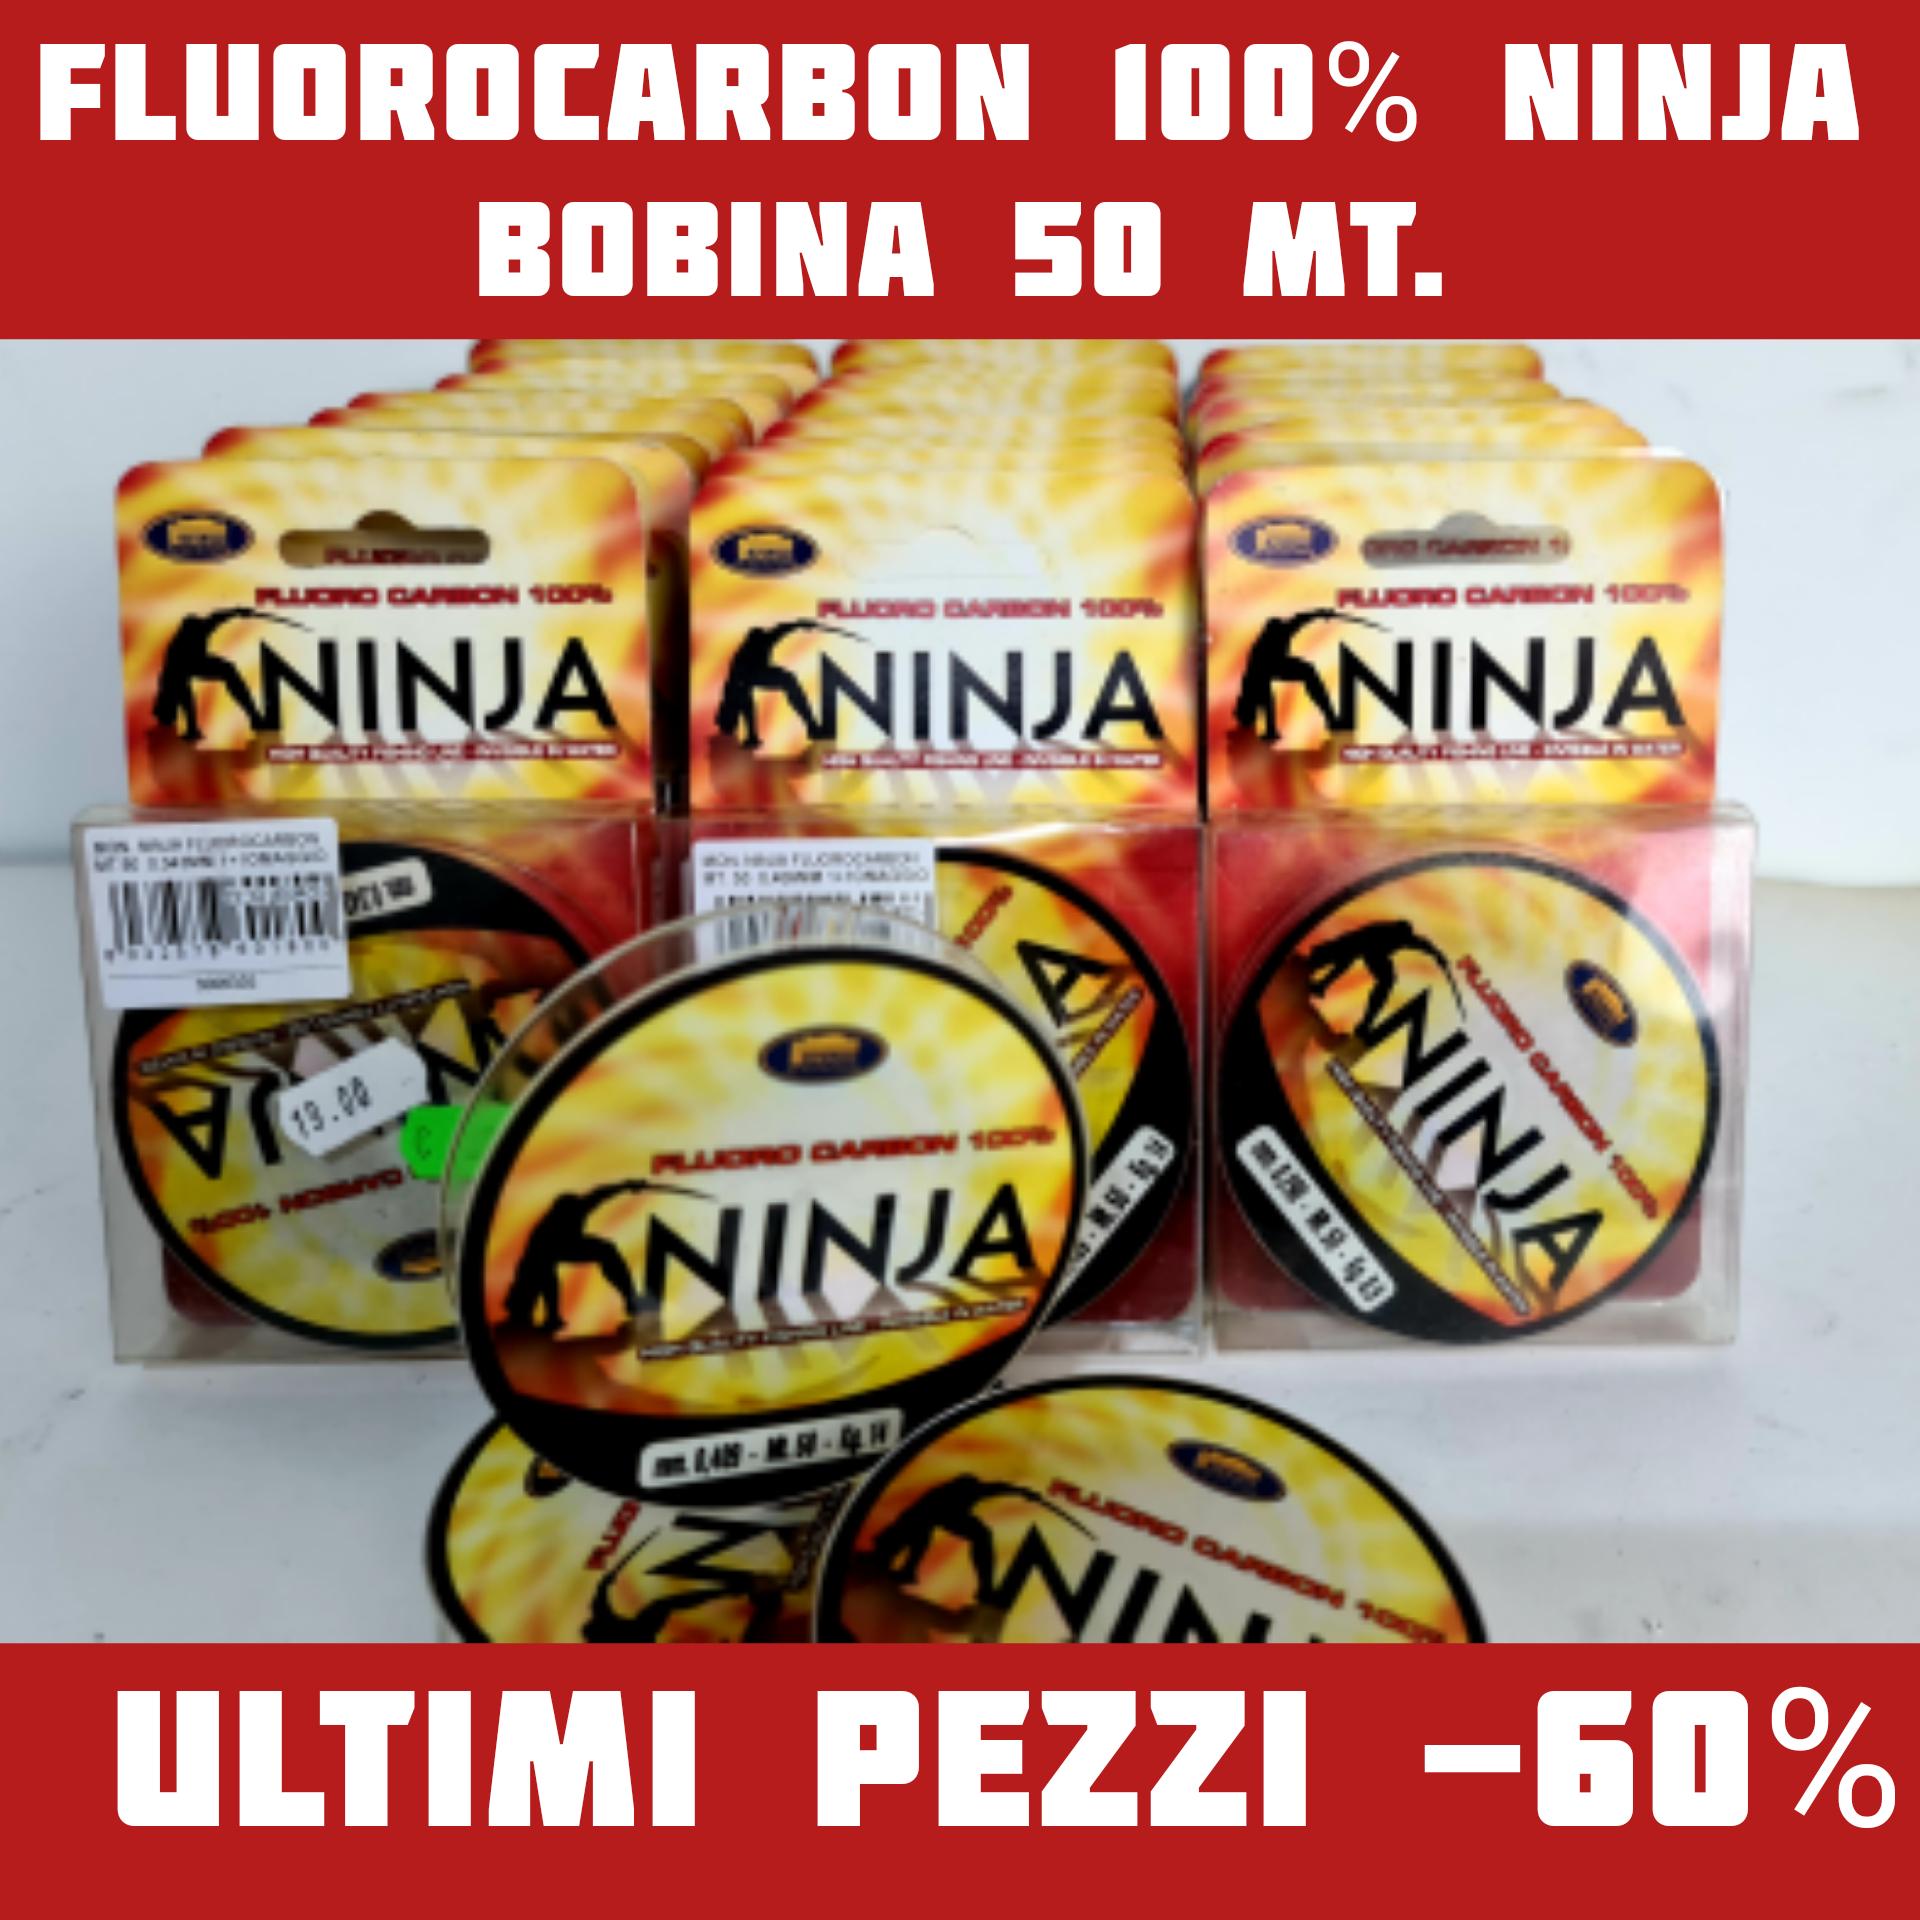 Ninja Fluorocarbon 100% -60% Fino ad Esaurimento